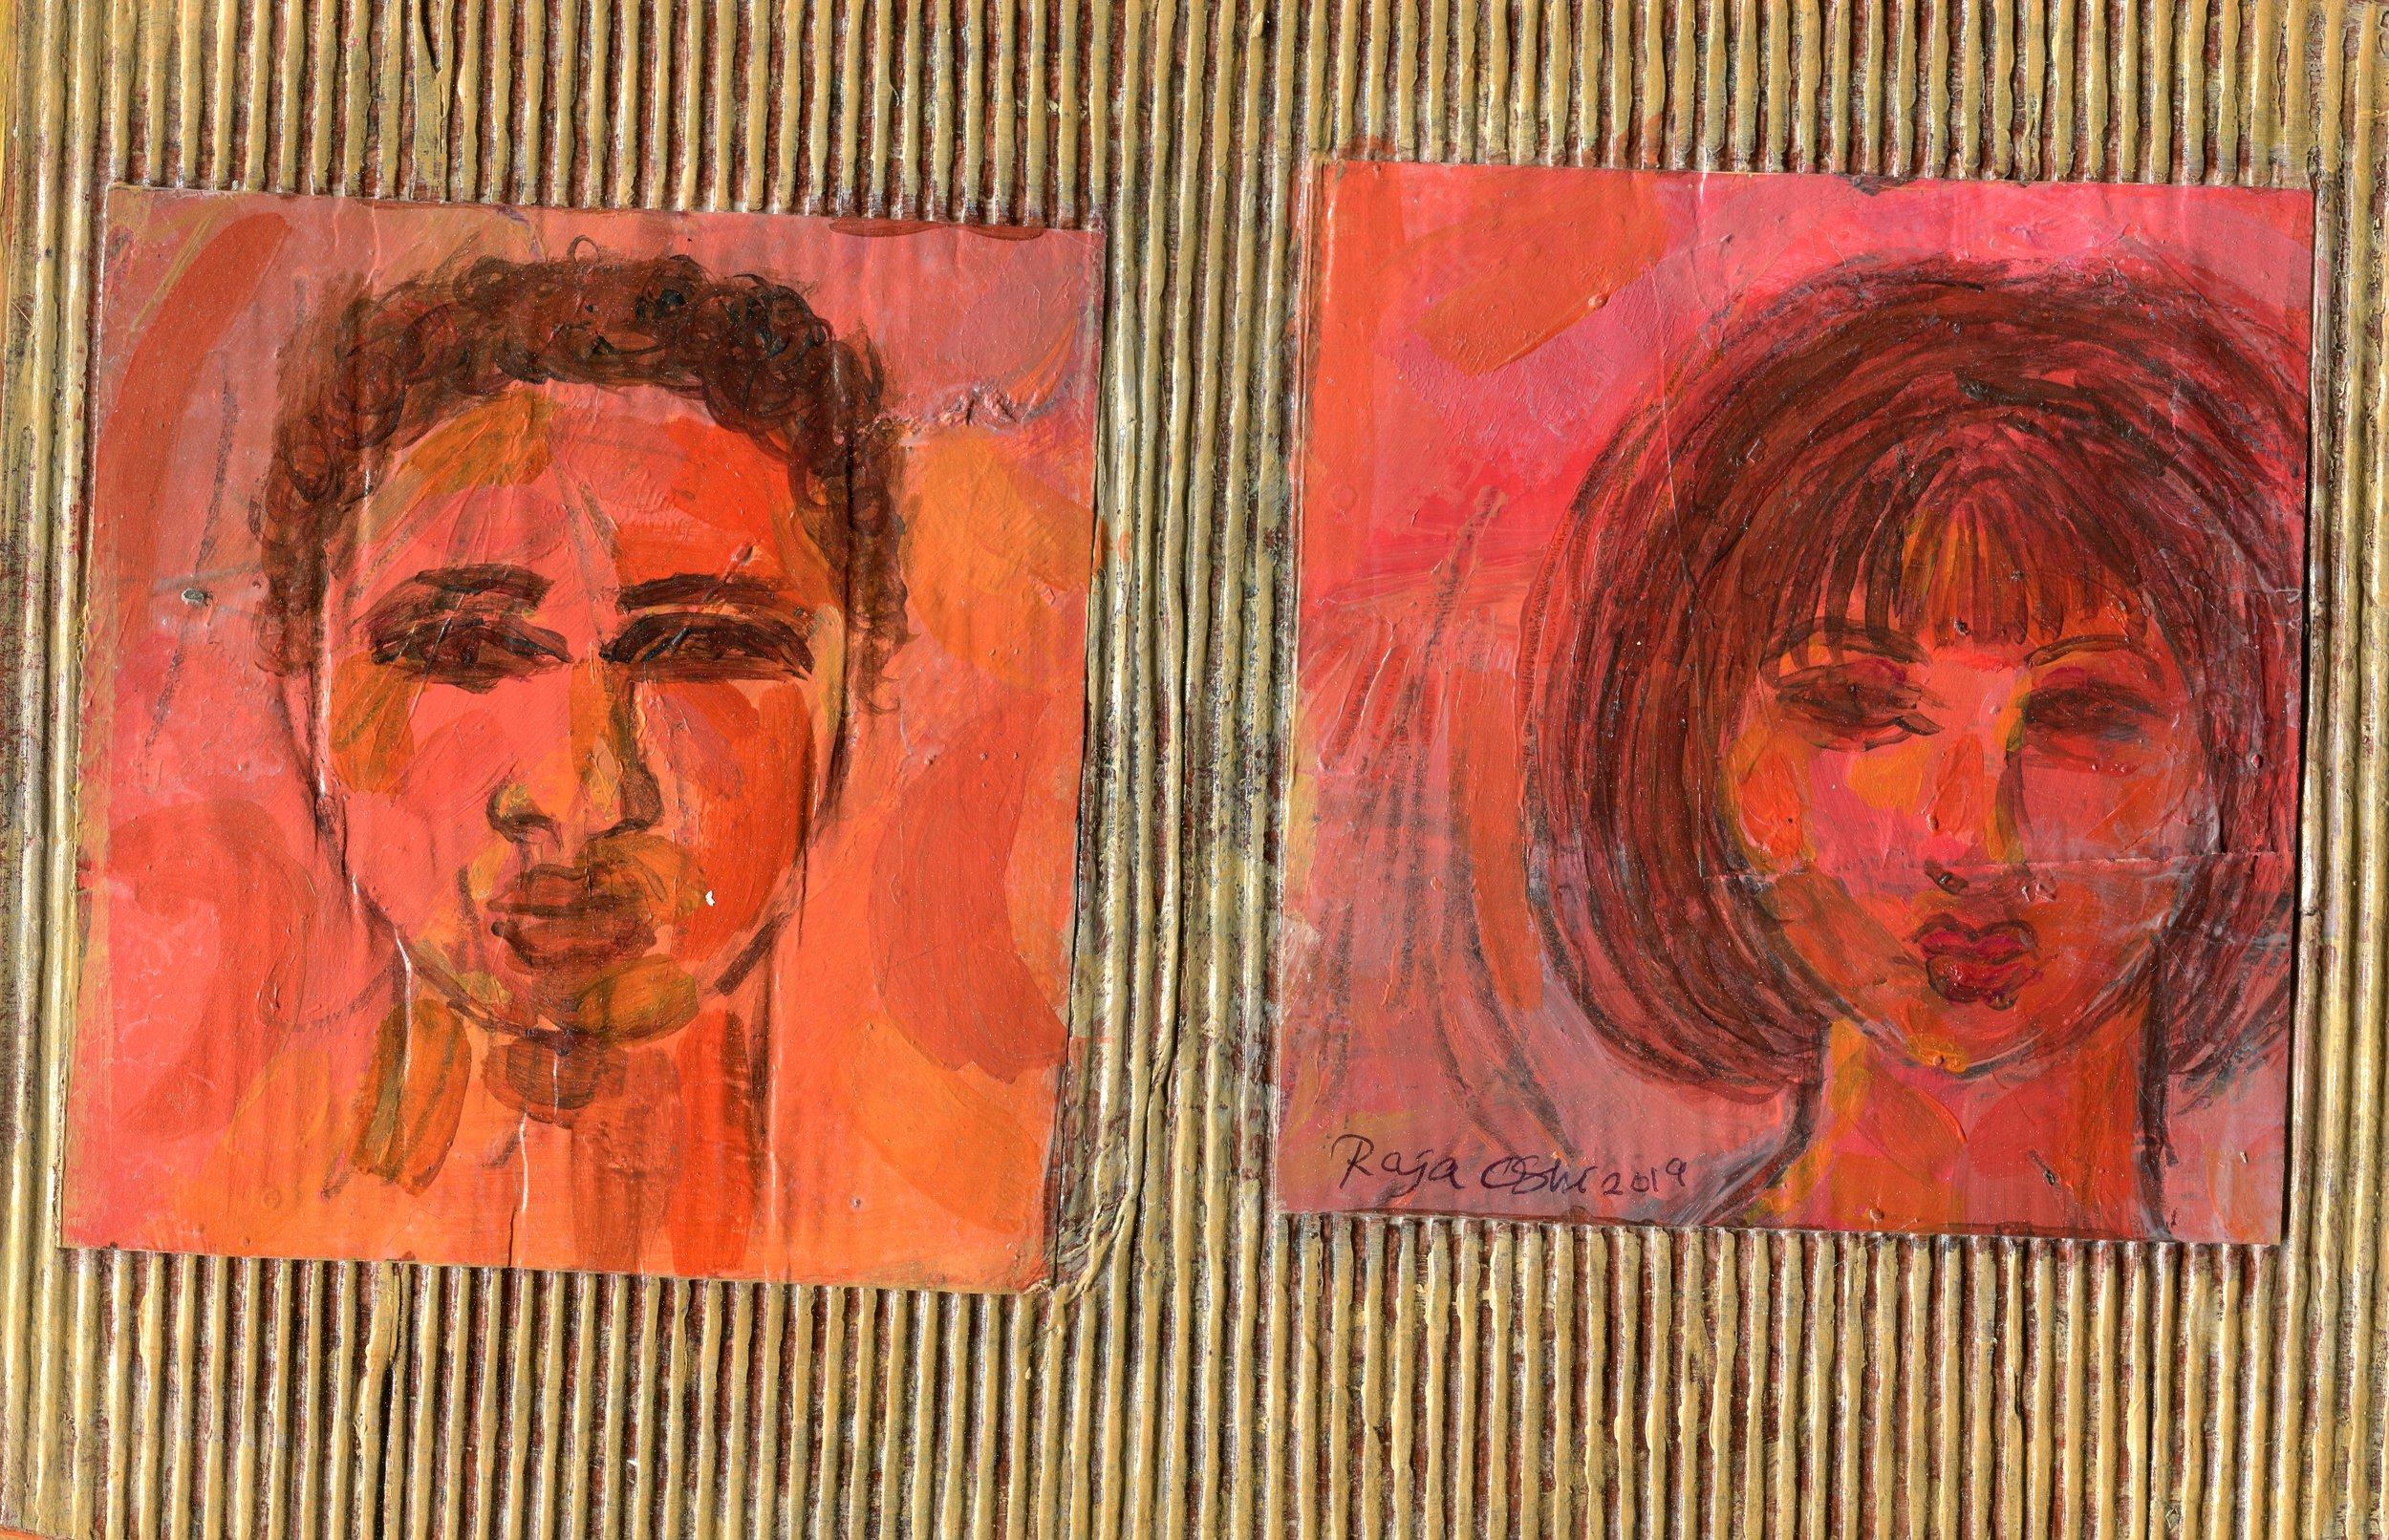 20b  Raja Oshi  Something like love  acrylic on paper